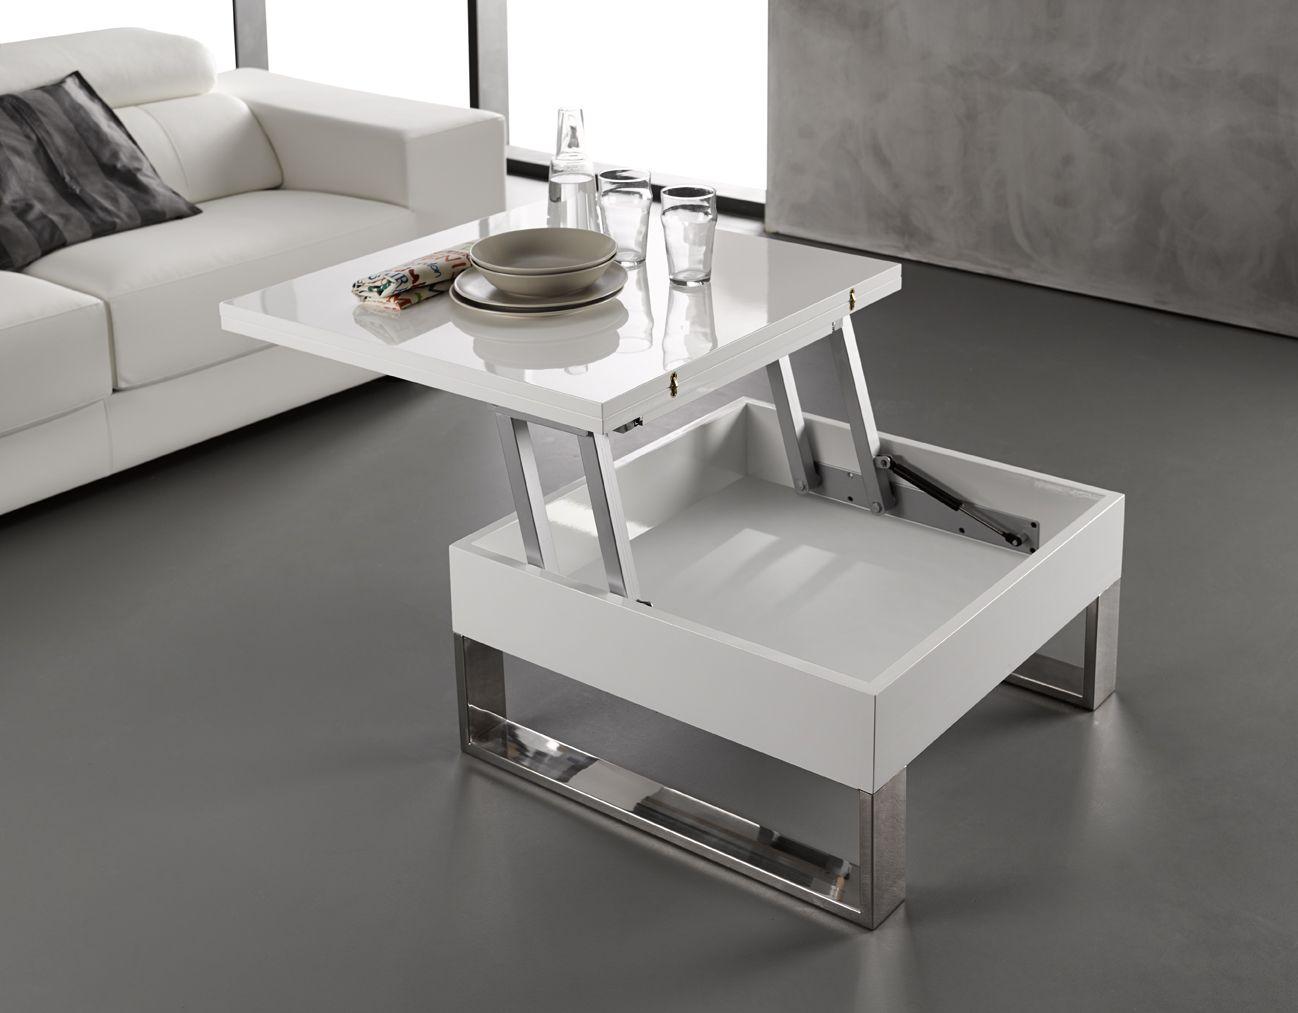 Etonnant Petite Table Basse Blanc Laque Center Table Living Room